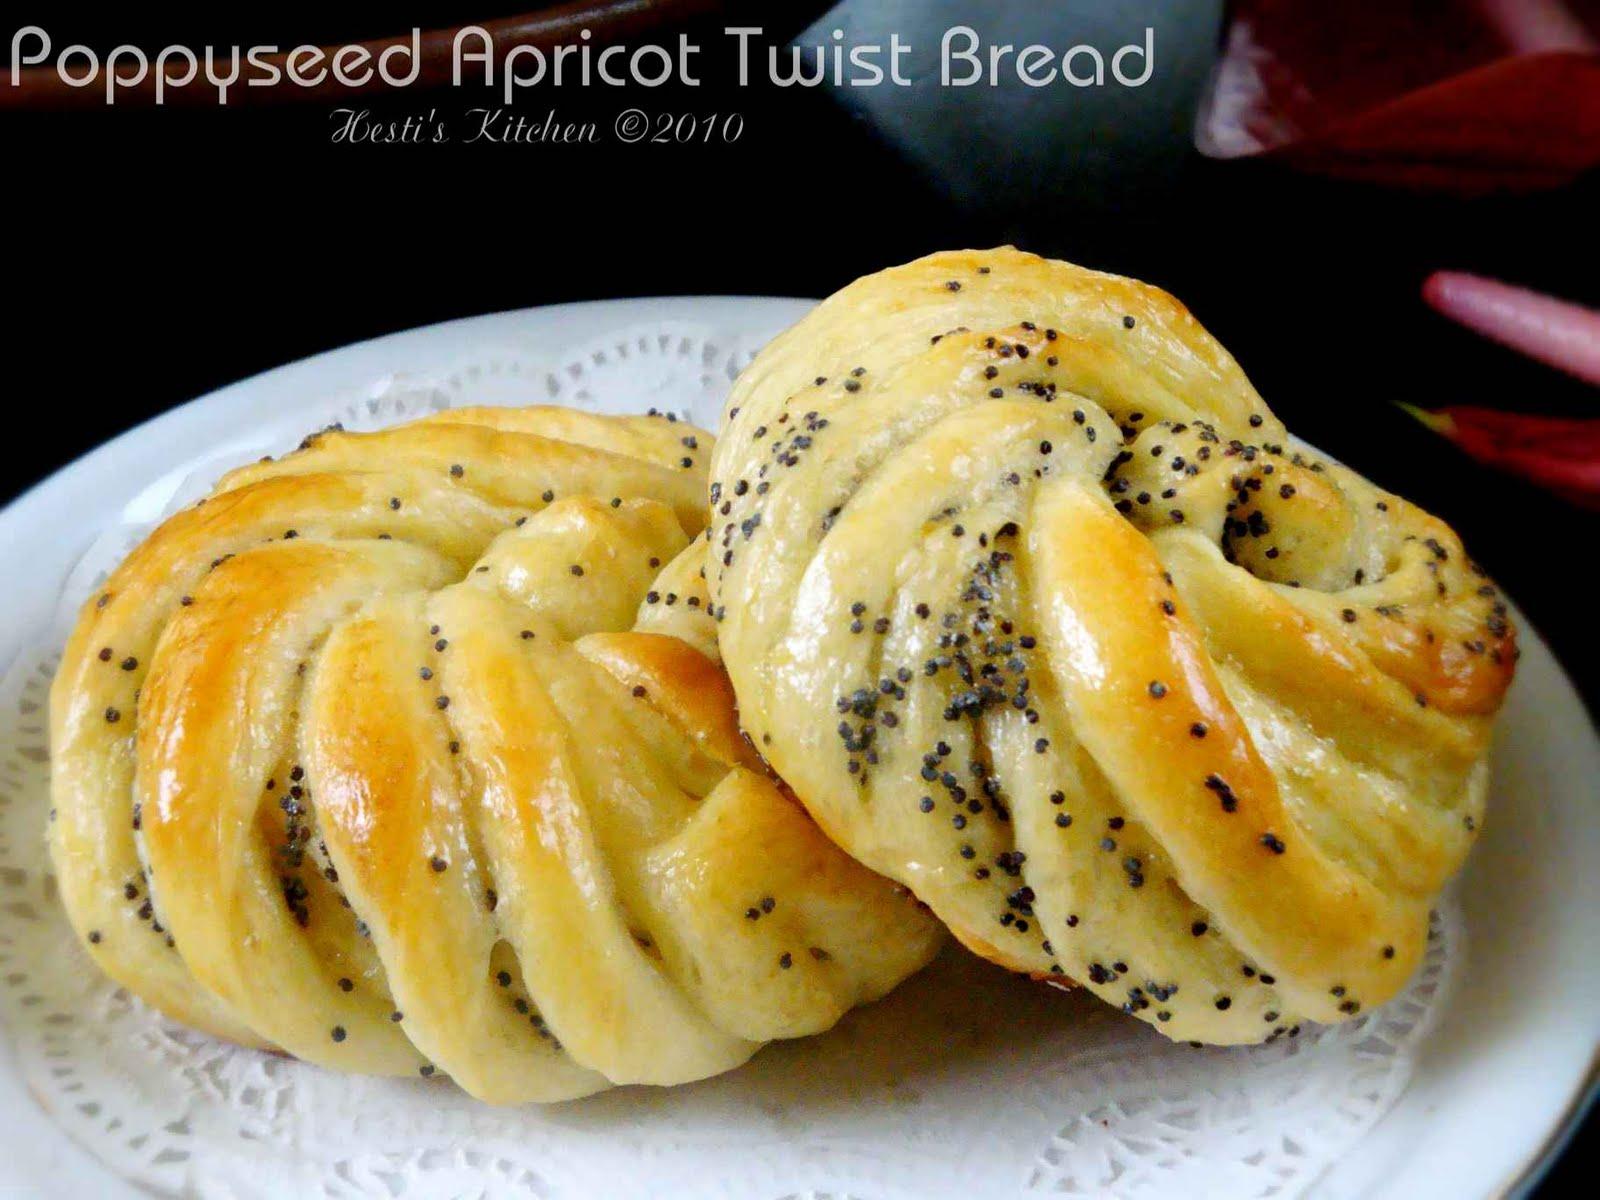 Resep Cake Kukus Hesti Kitchen: HESTI'S KITCHEN : Yummy For Your Tummy: Aneka Roti Manis